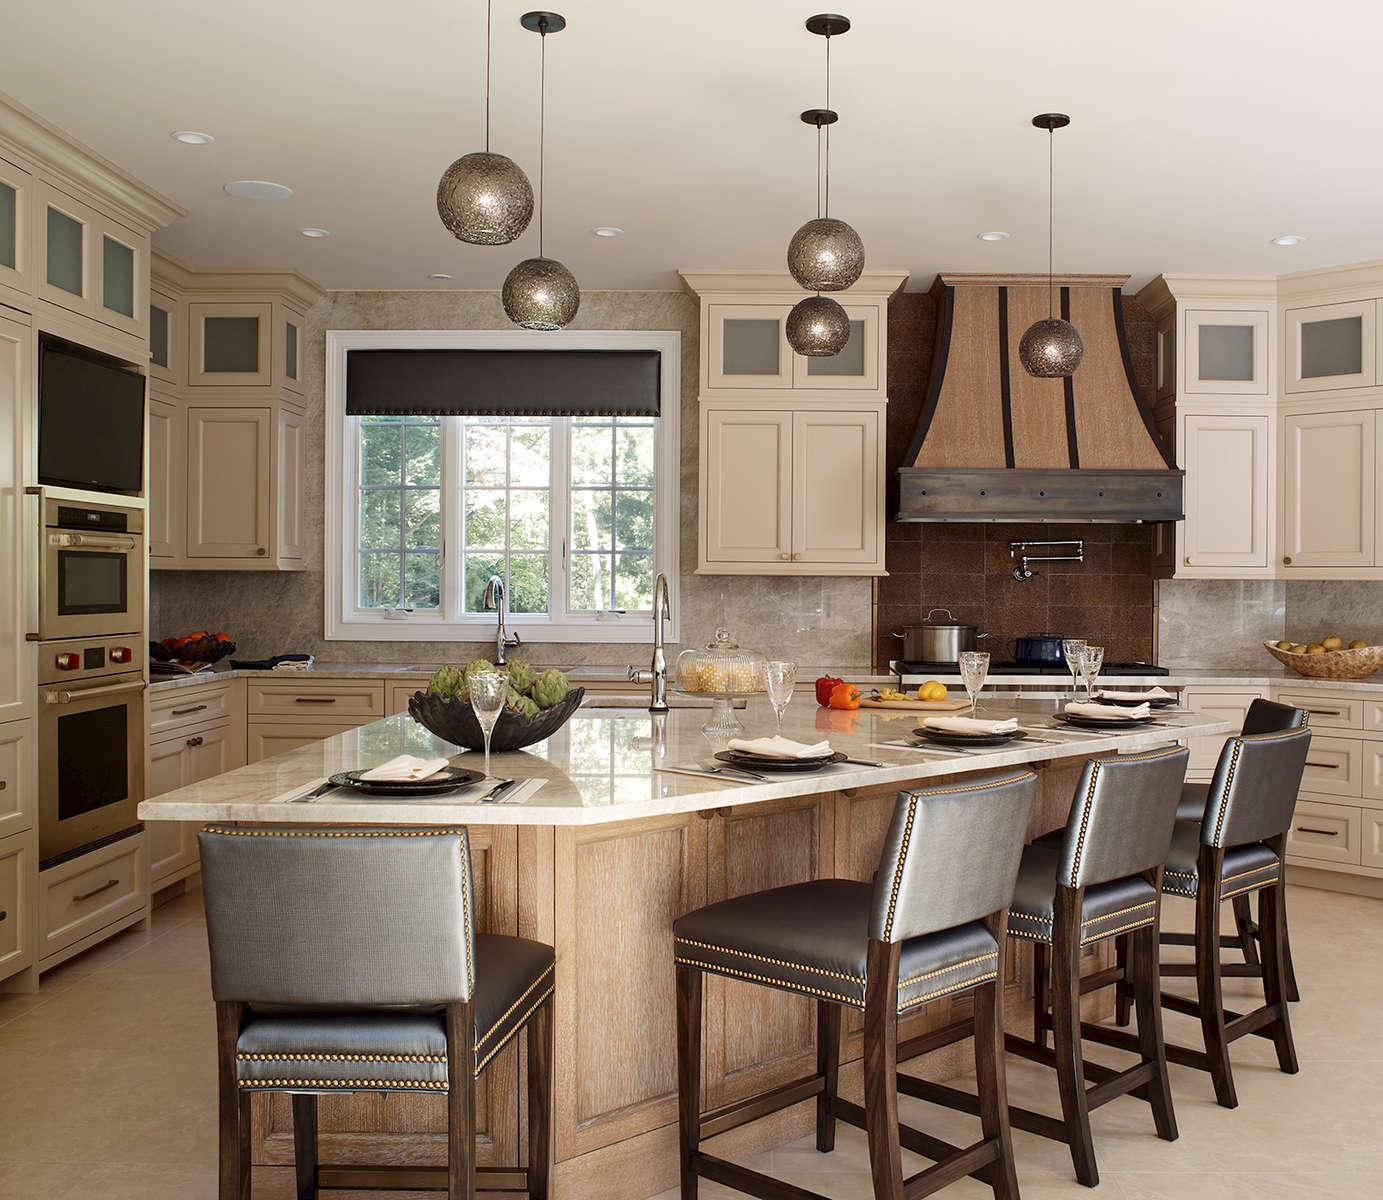 Belle Terre Kitchen Renovation